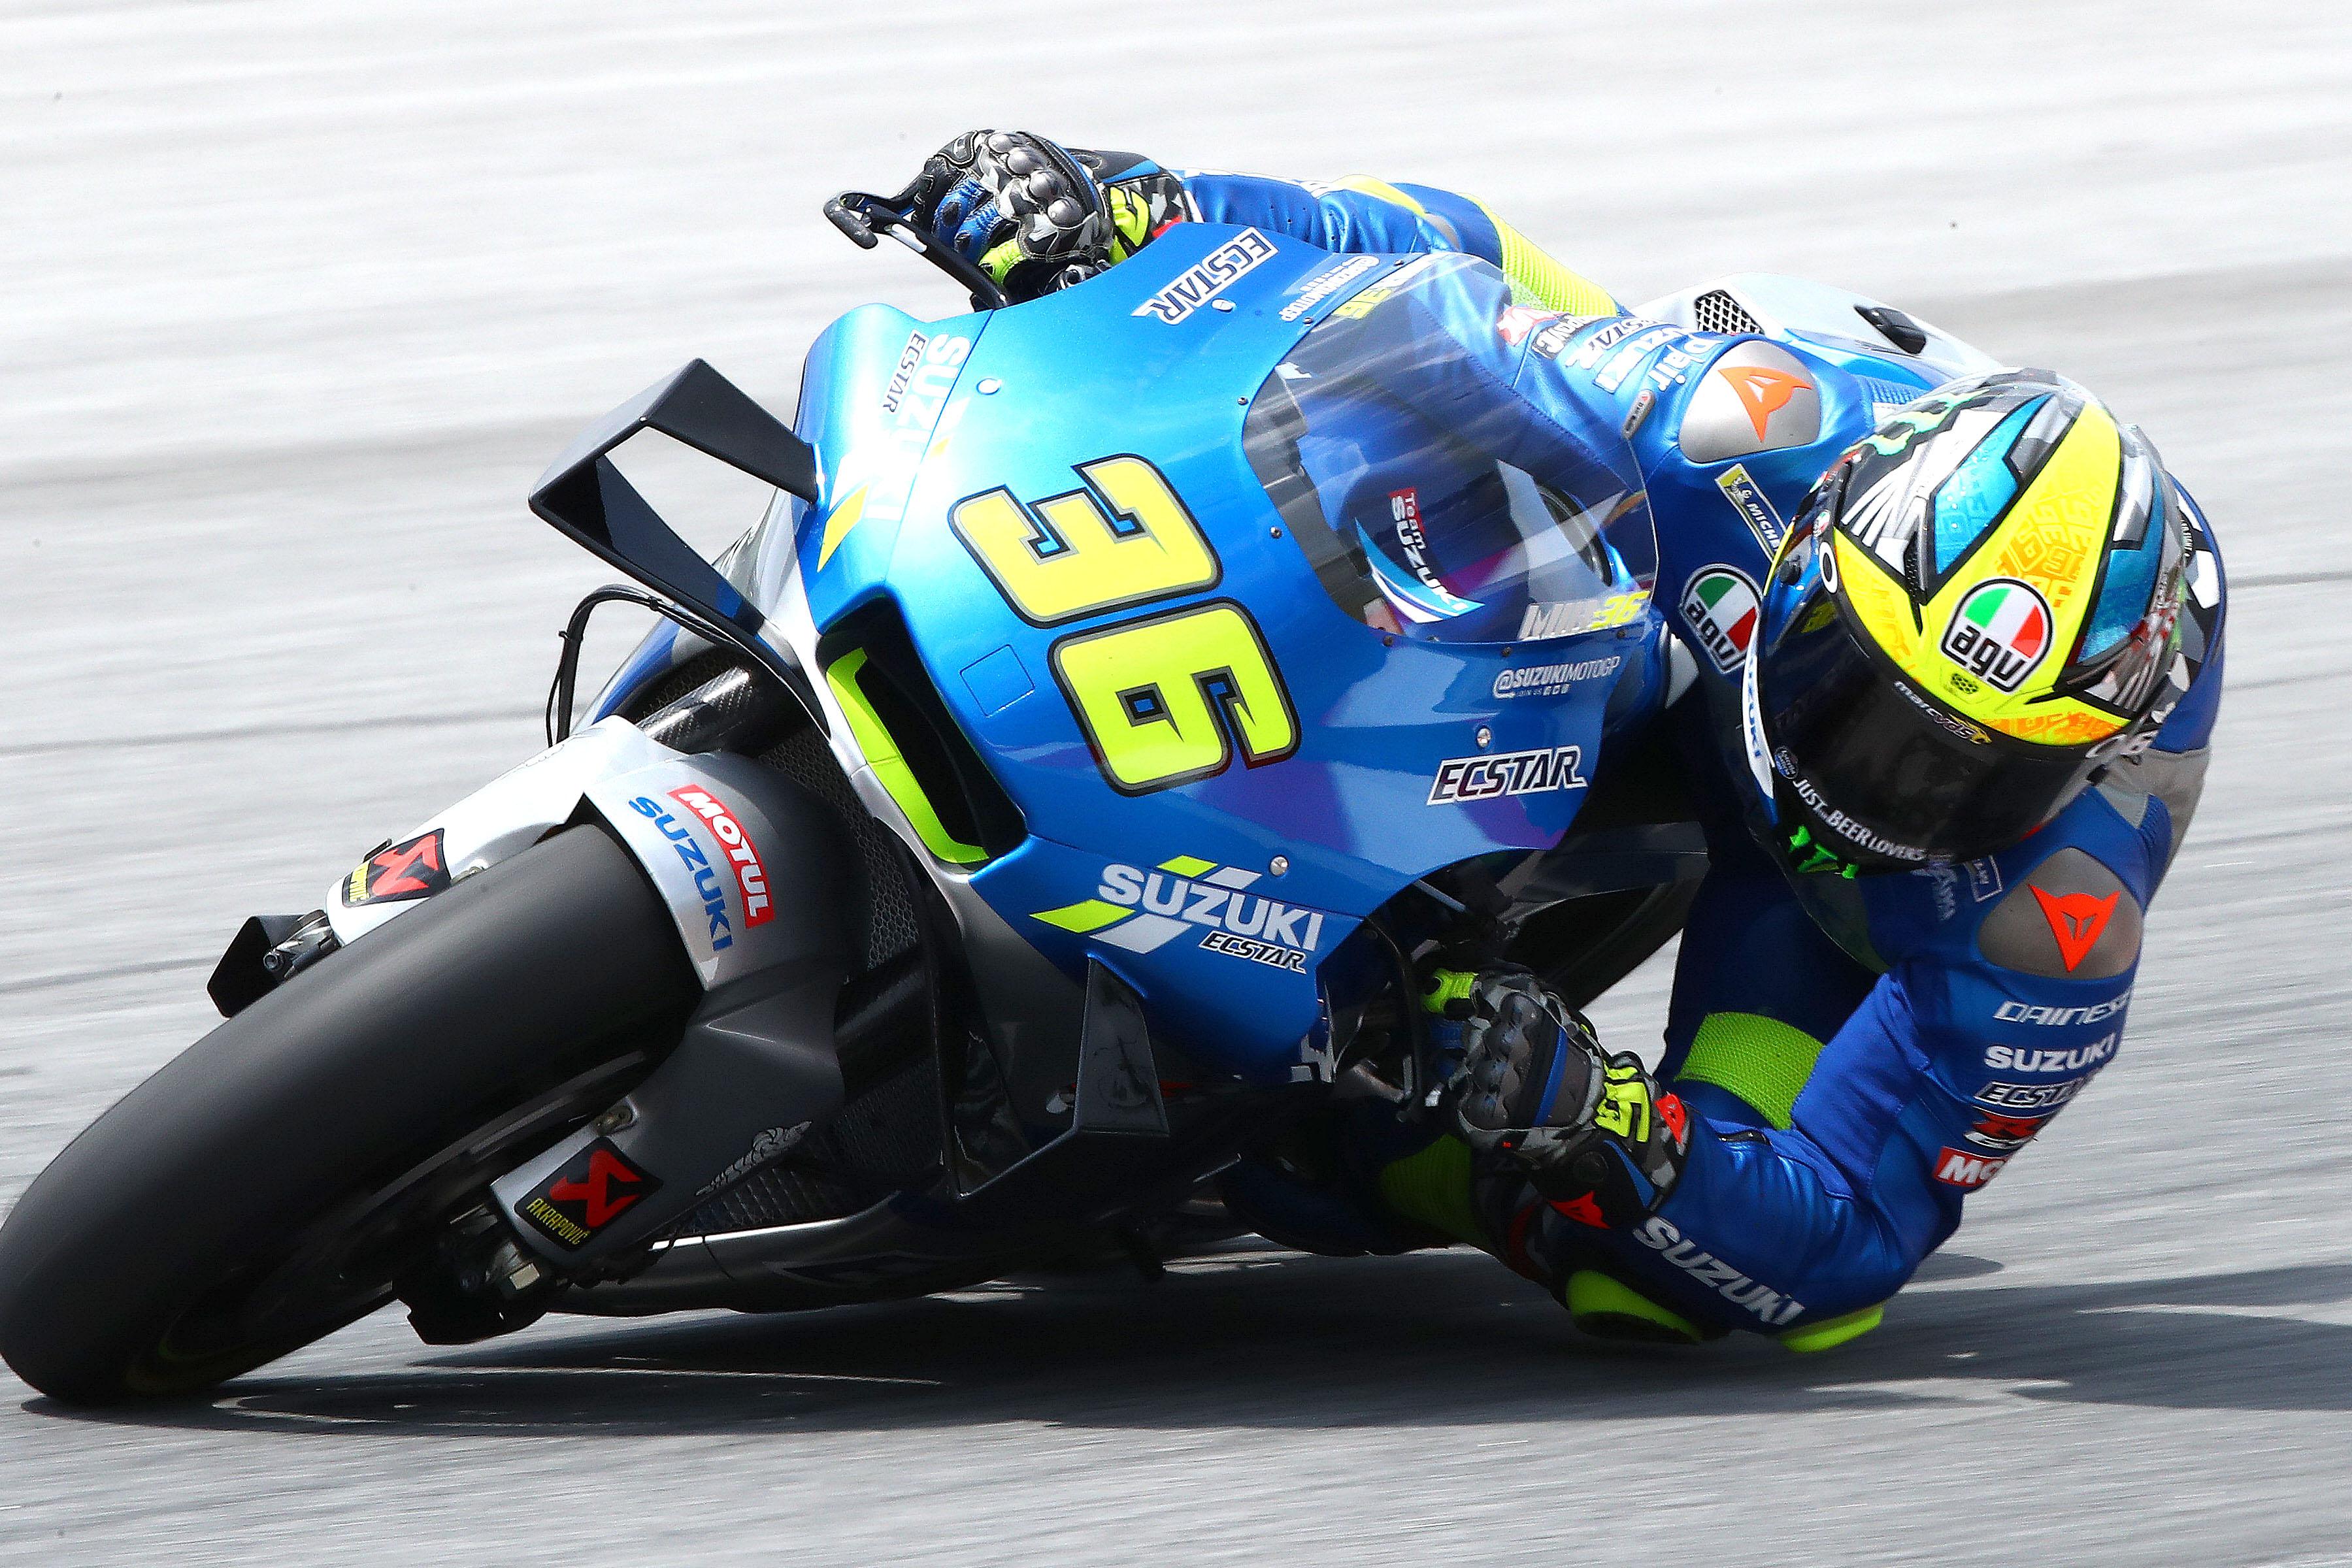 Suzuki completes 2021-22 MotoGP line-up by retaining Mir ...